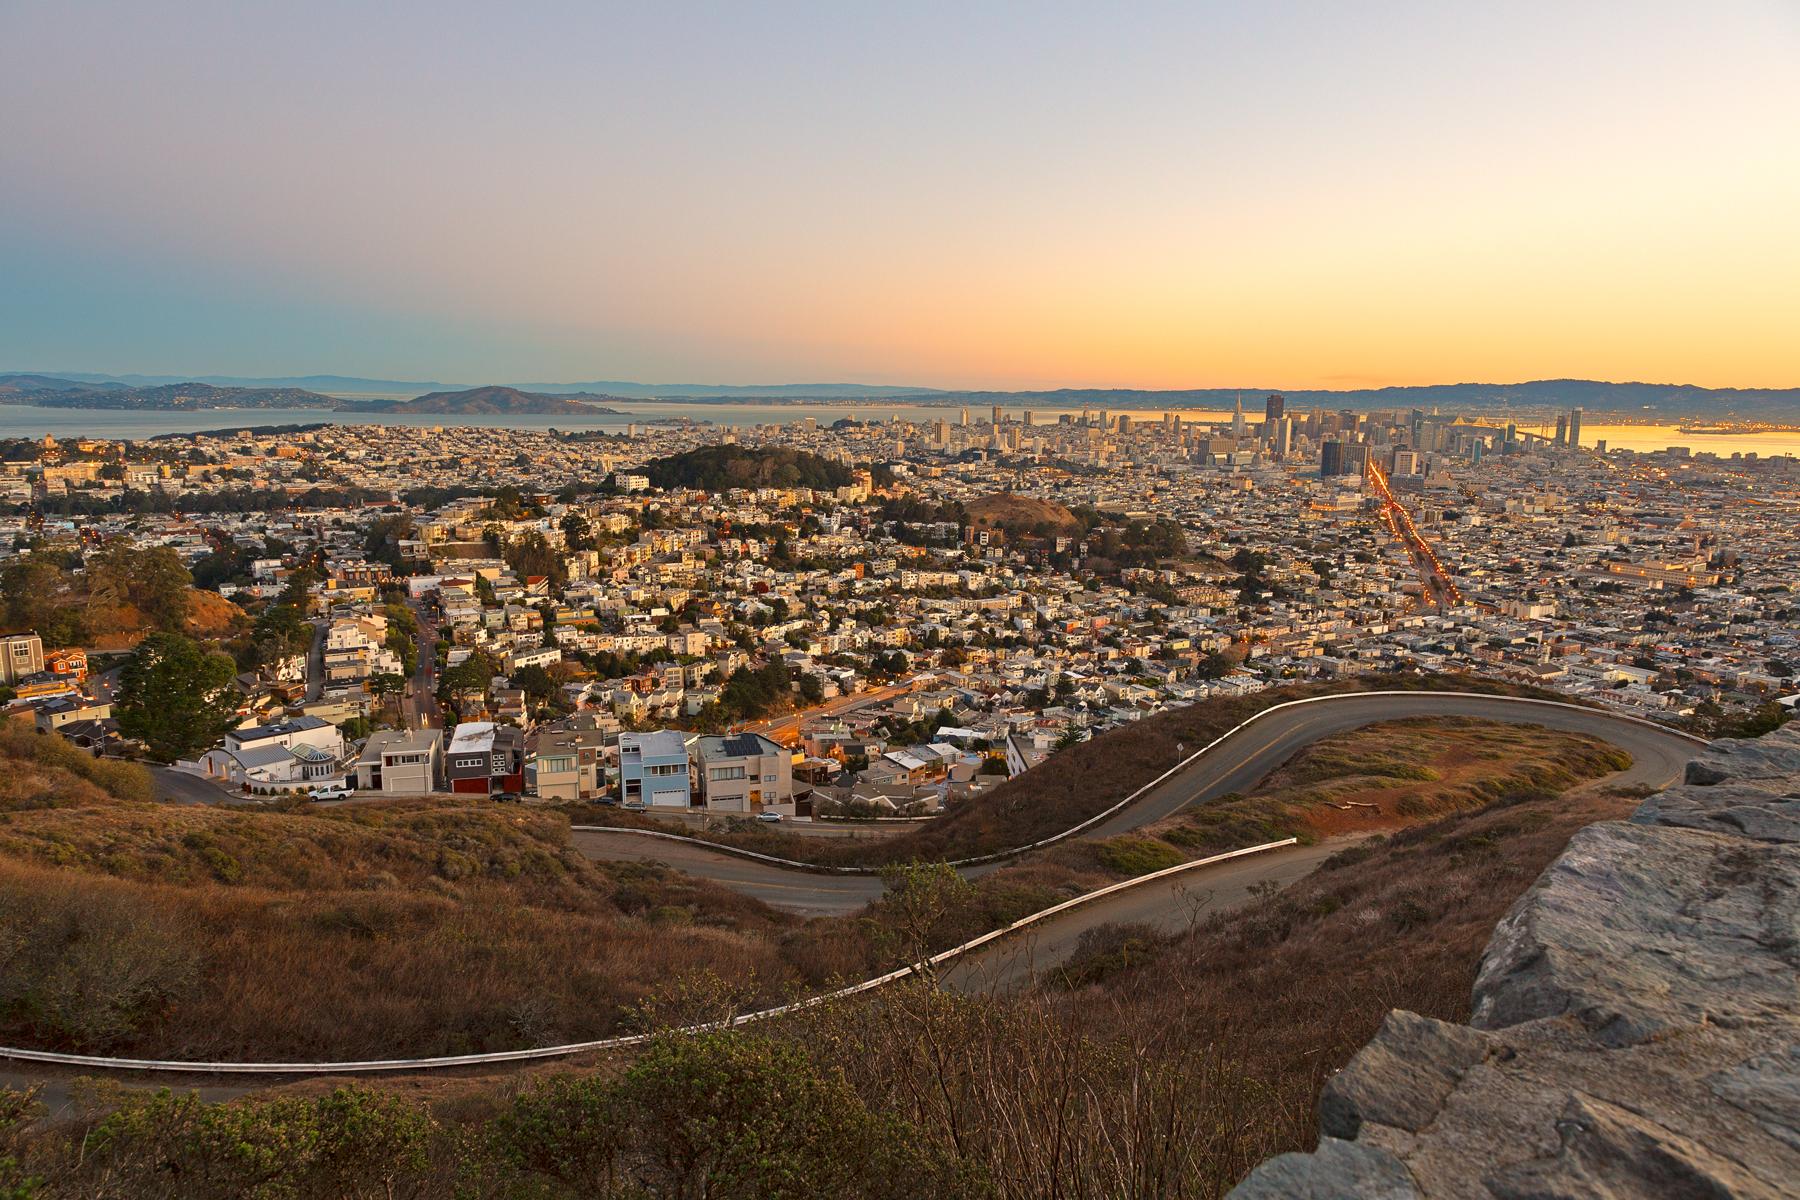 San francisco sunrise - hdr photo